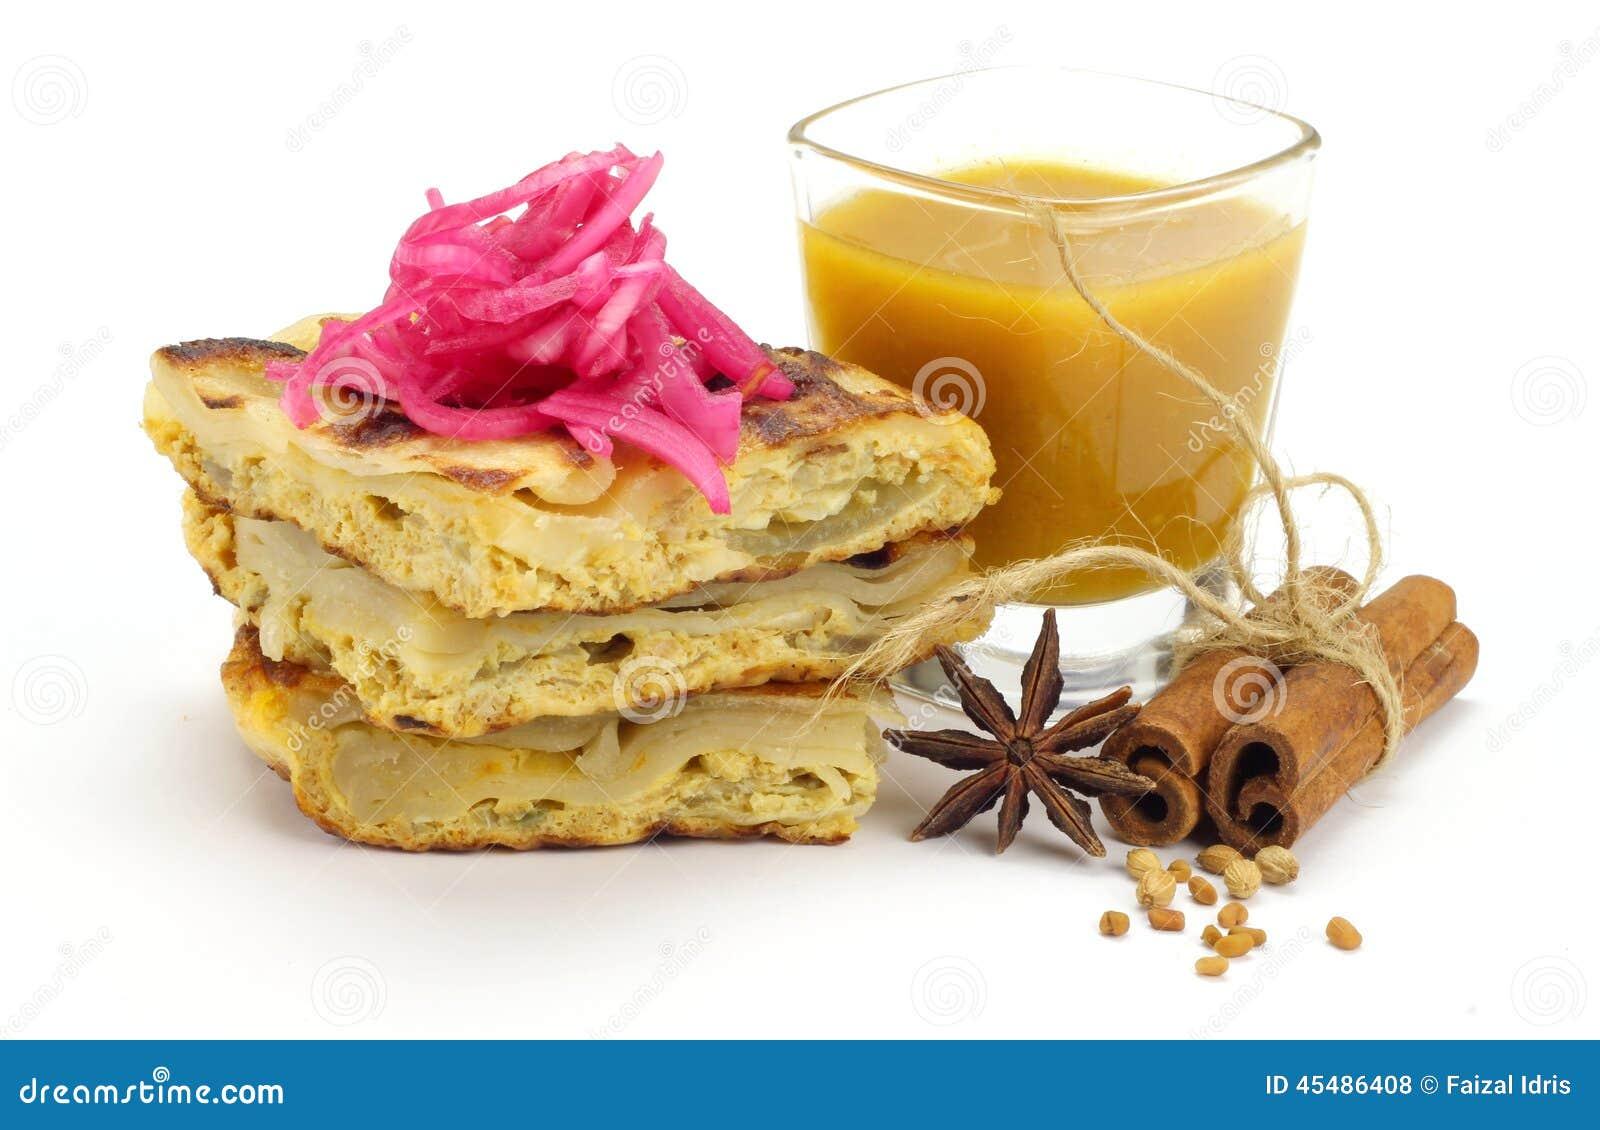 Murtabak用Dhall小汤和葱腌汁